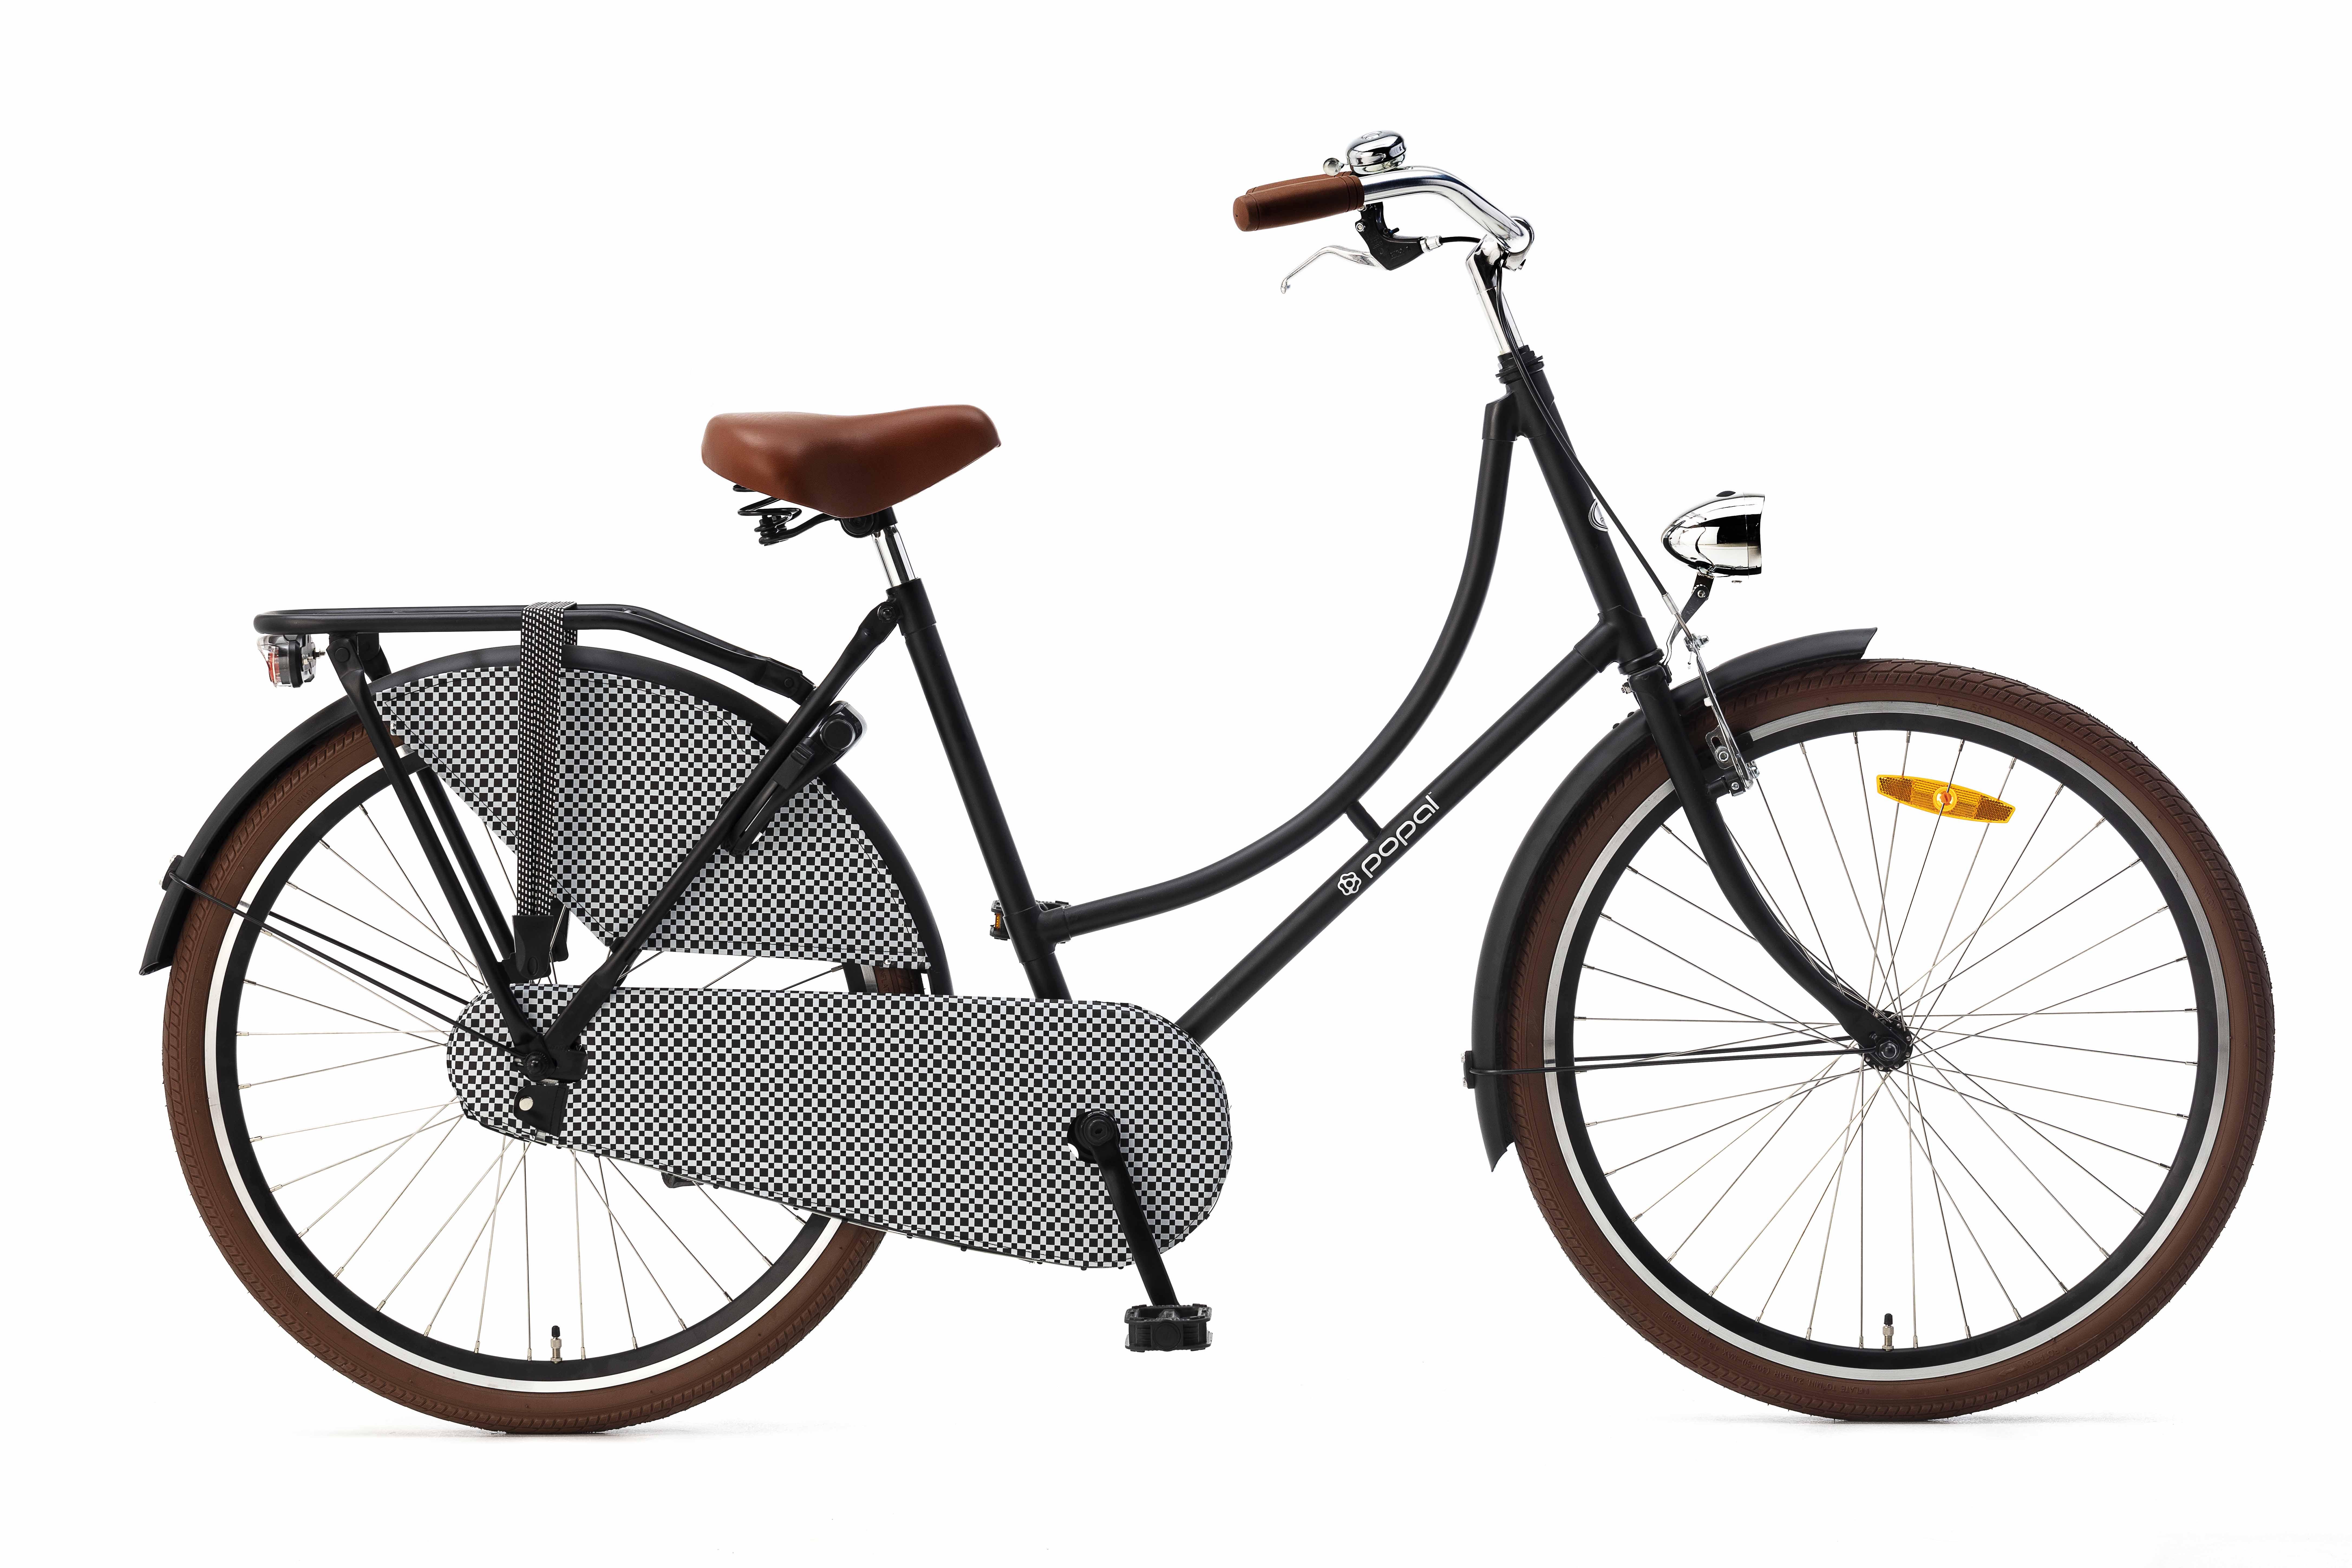 https://fietsenhalsteenwijk.files.wordpress.com/2019/01/oma-zwart-wit.jpg